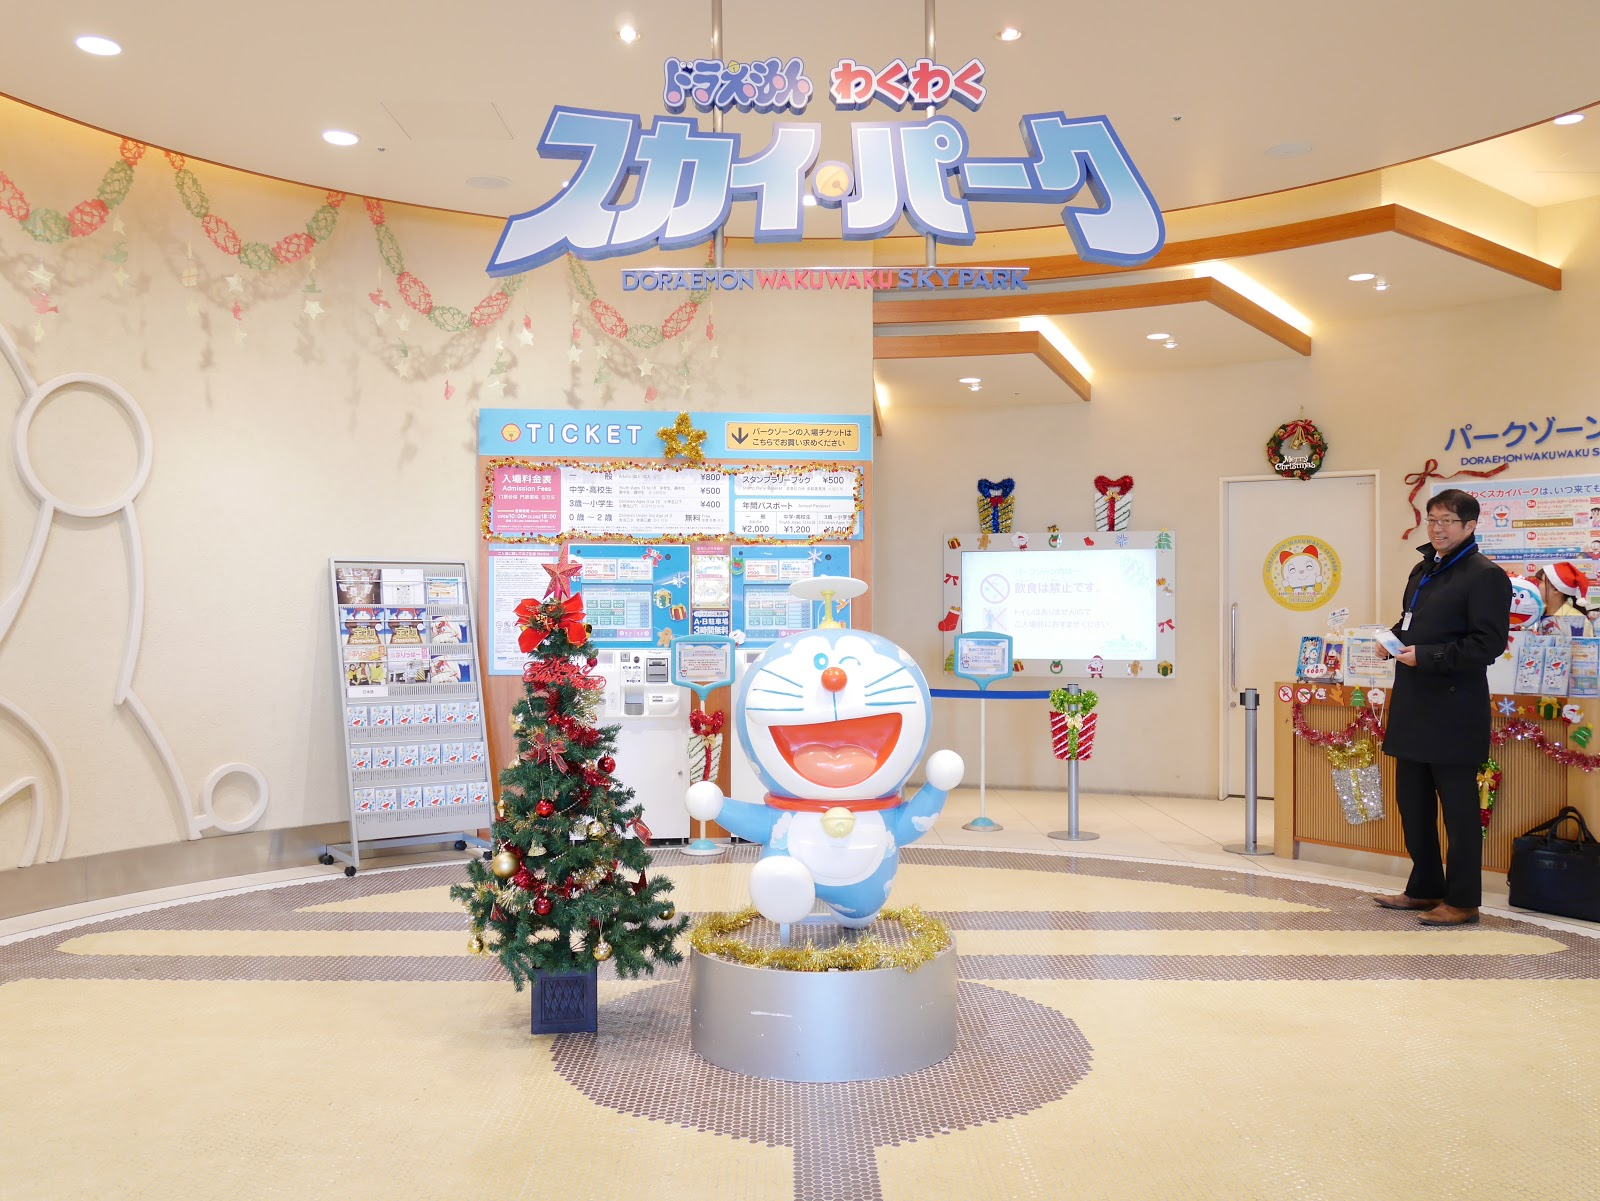 Entry Bergambar Hokkaido Day 1 Media Panas Tcash Vaganza 17 Kk New Motif 2016 Ni Entrance Nak Masuk Doraemon Wakuwaru Skyparkmuka Very Welcoming Gitu